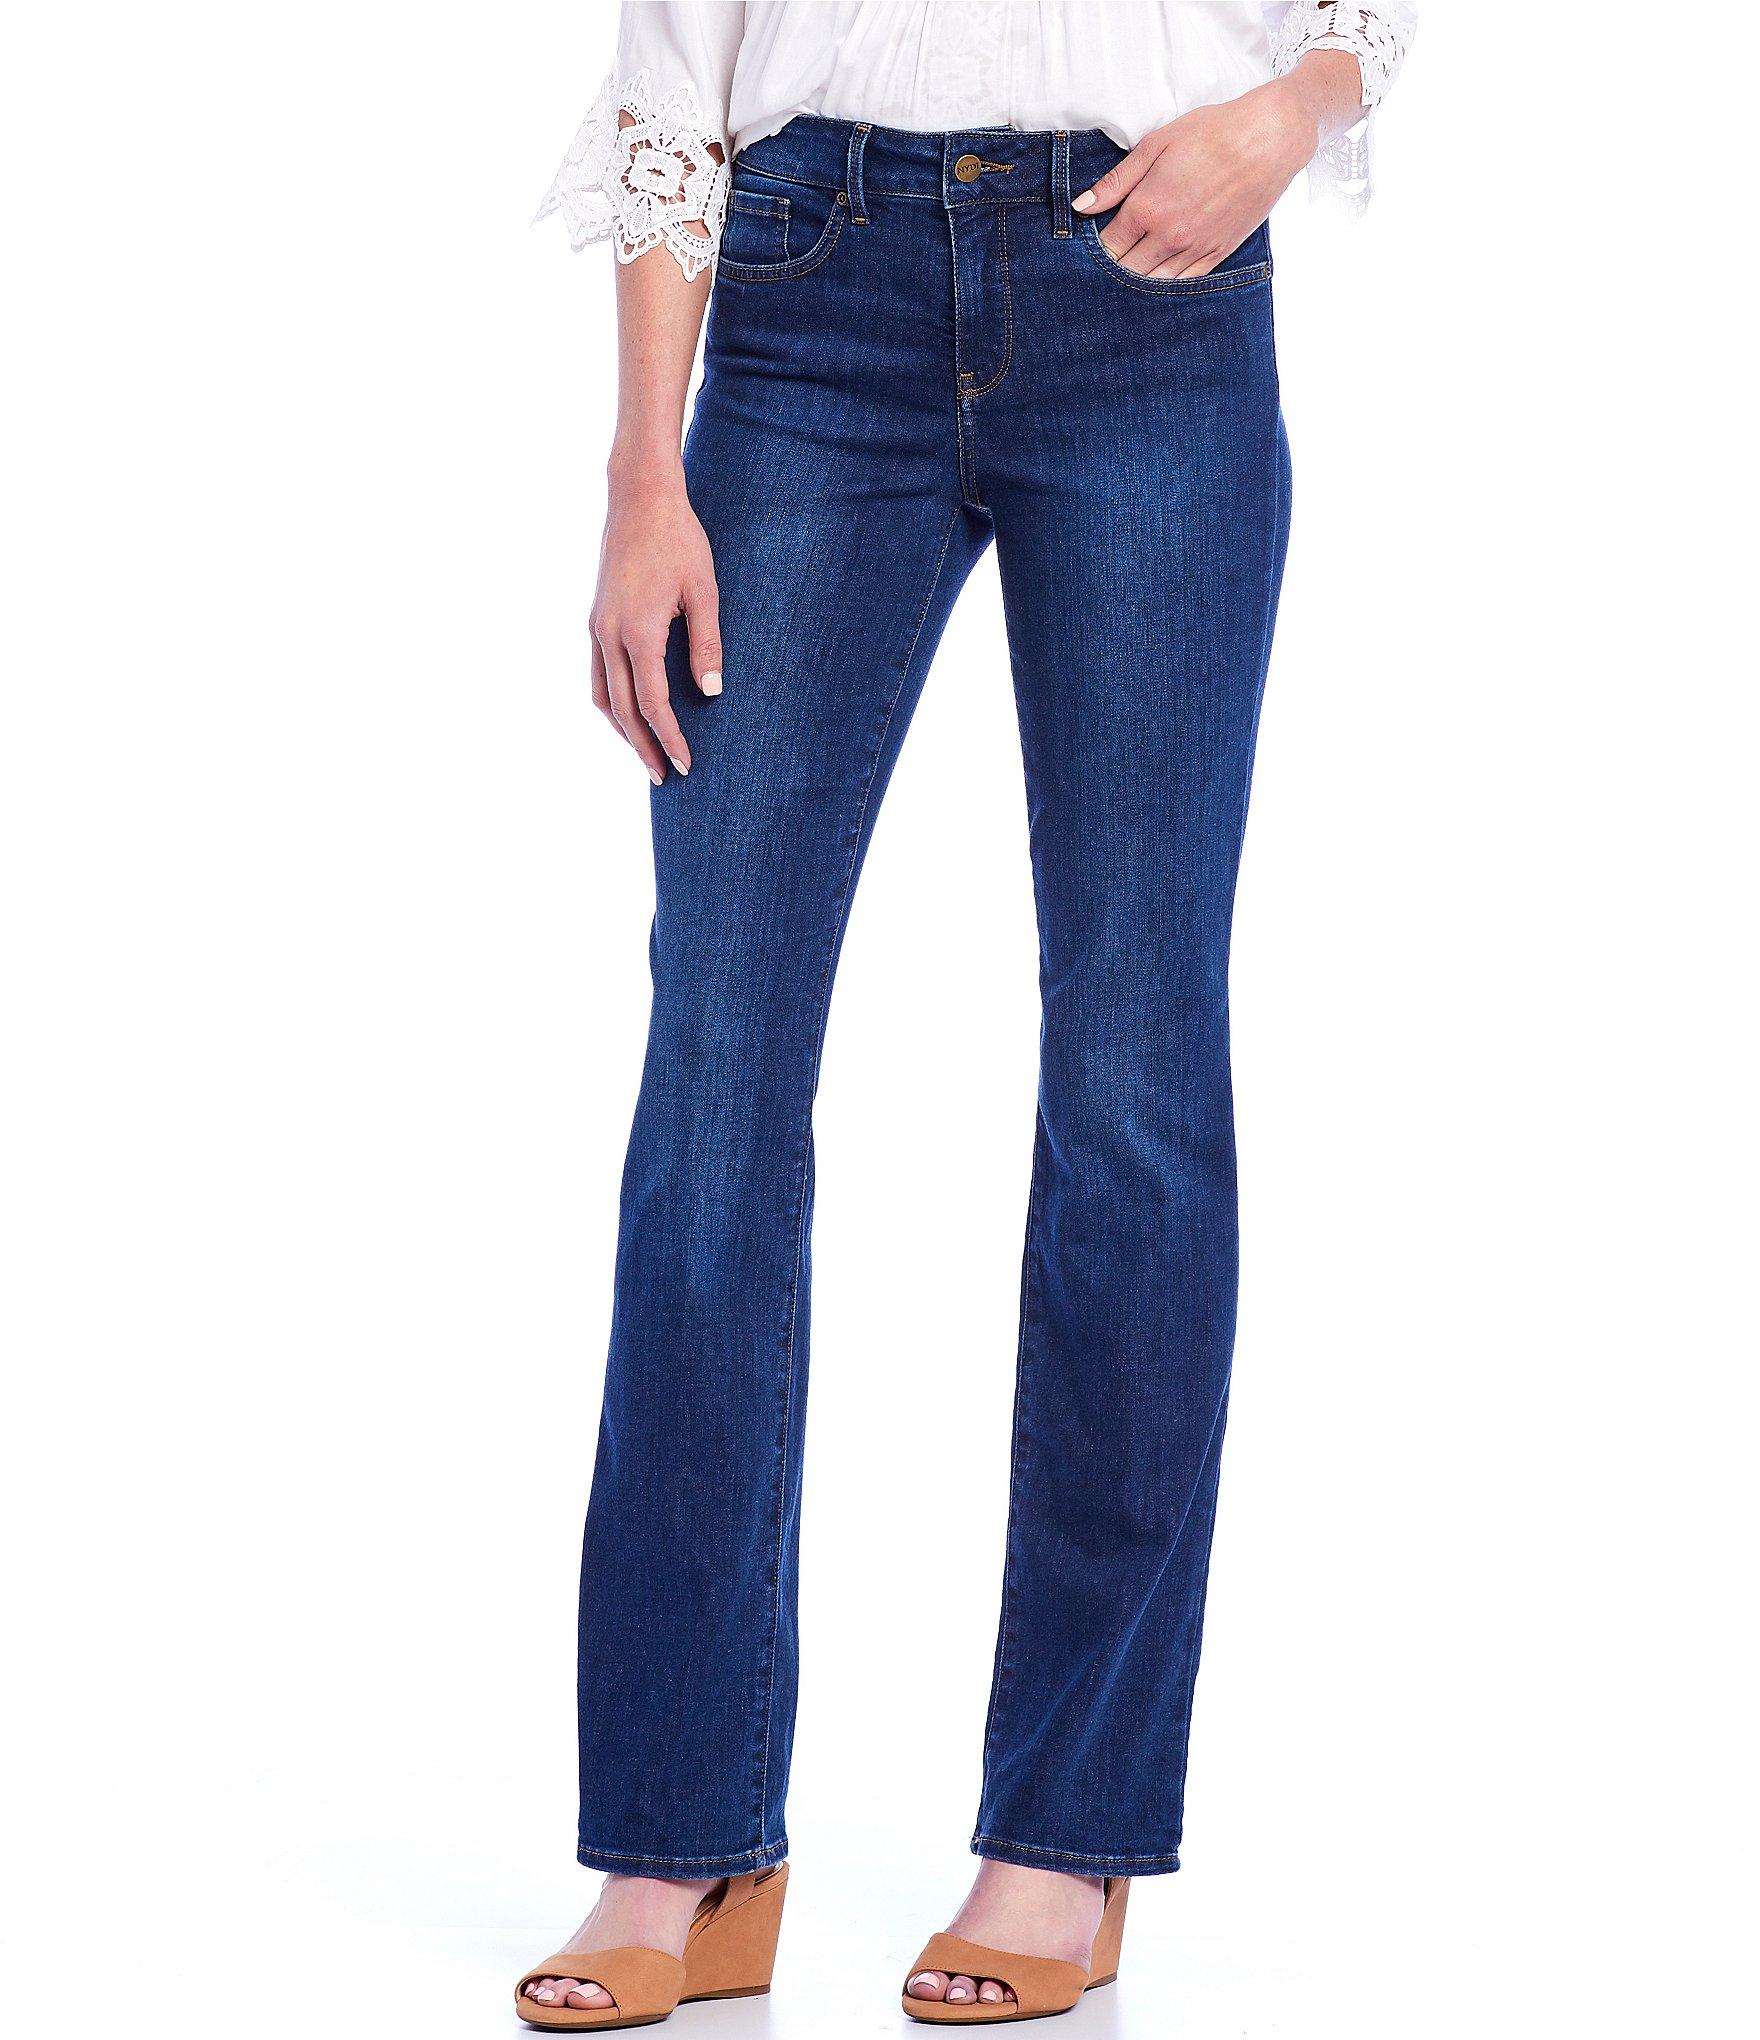 008ba8444 Women's Jeans & Denim   Dillard's